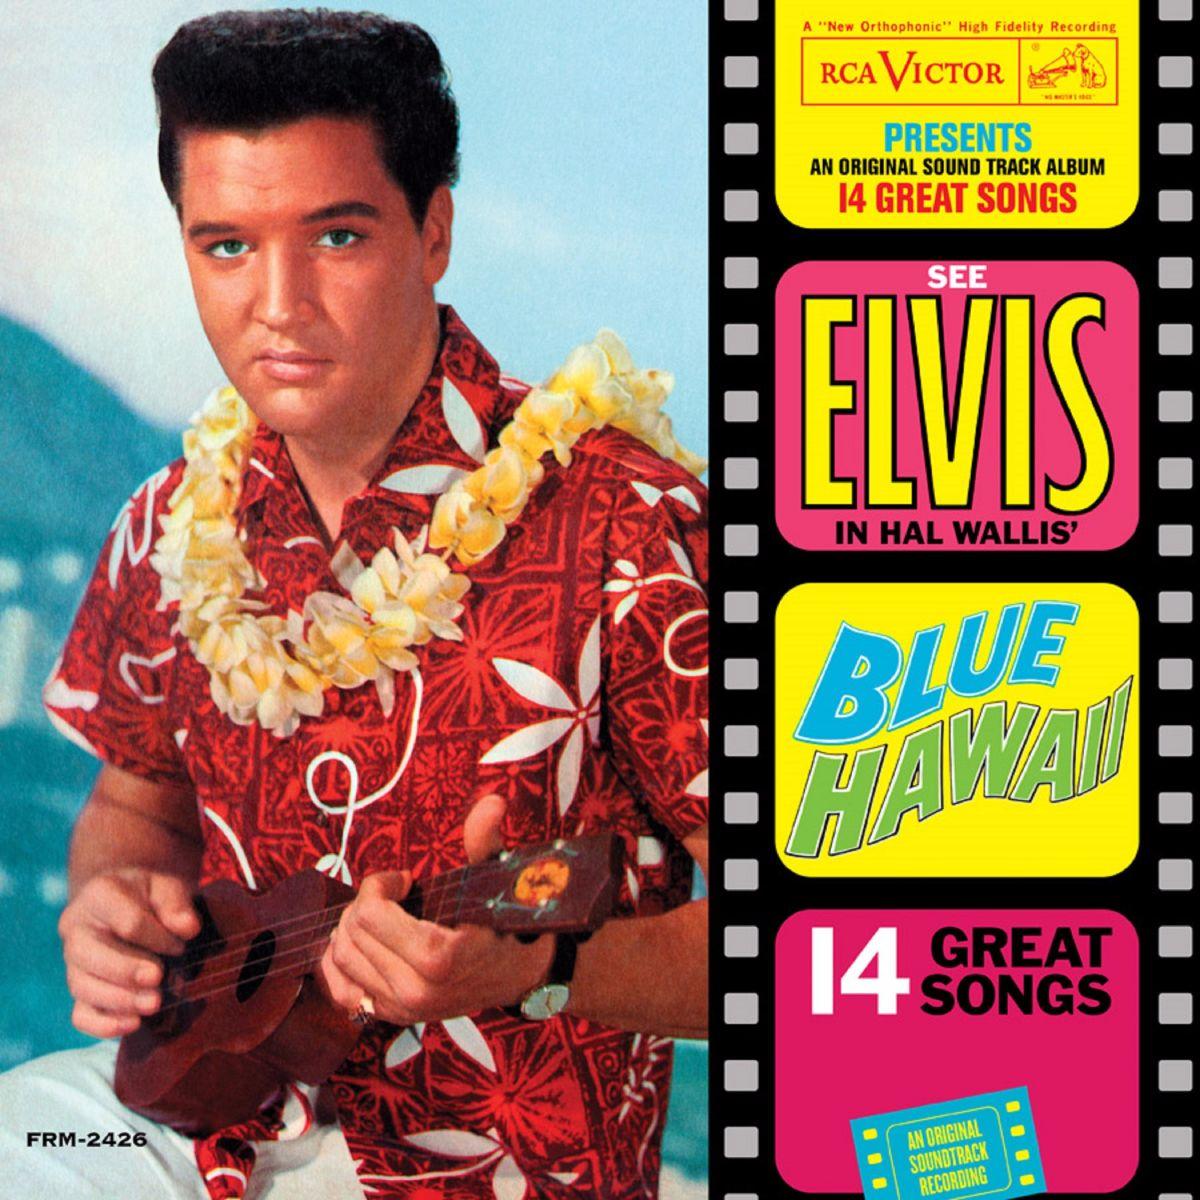 Elvis Presley - Blue Hawaii (180 Gram Audiophile Translucent Blue Vinyl/Limited Anniversary Edition/Gatefold Cover)